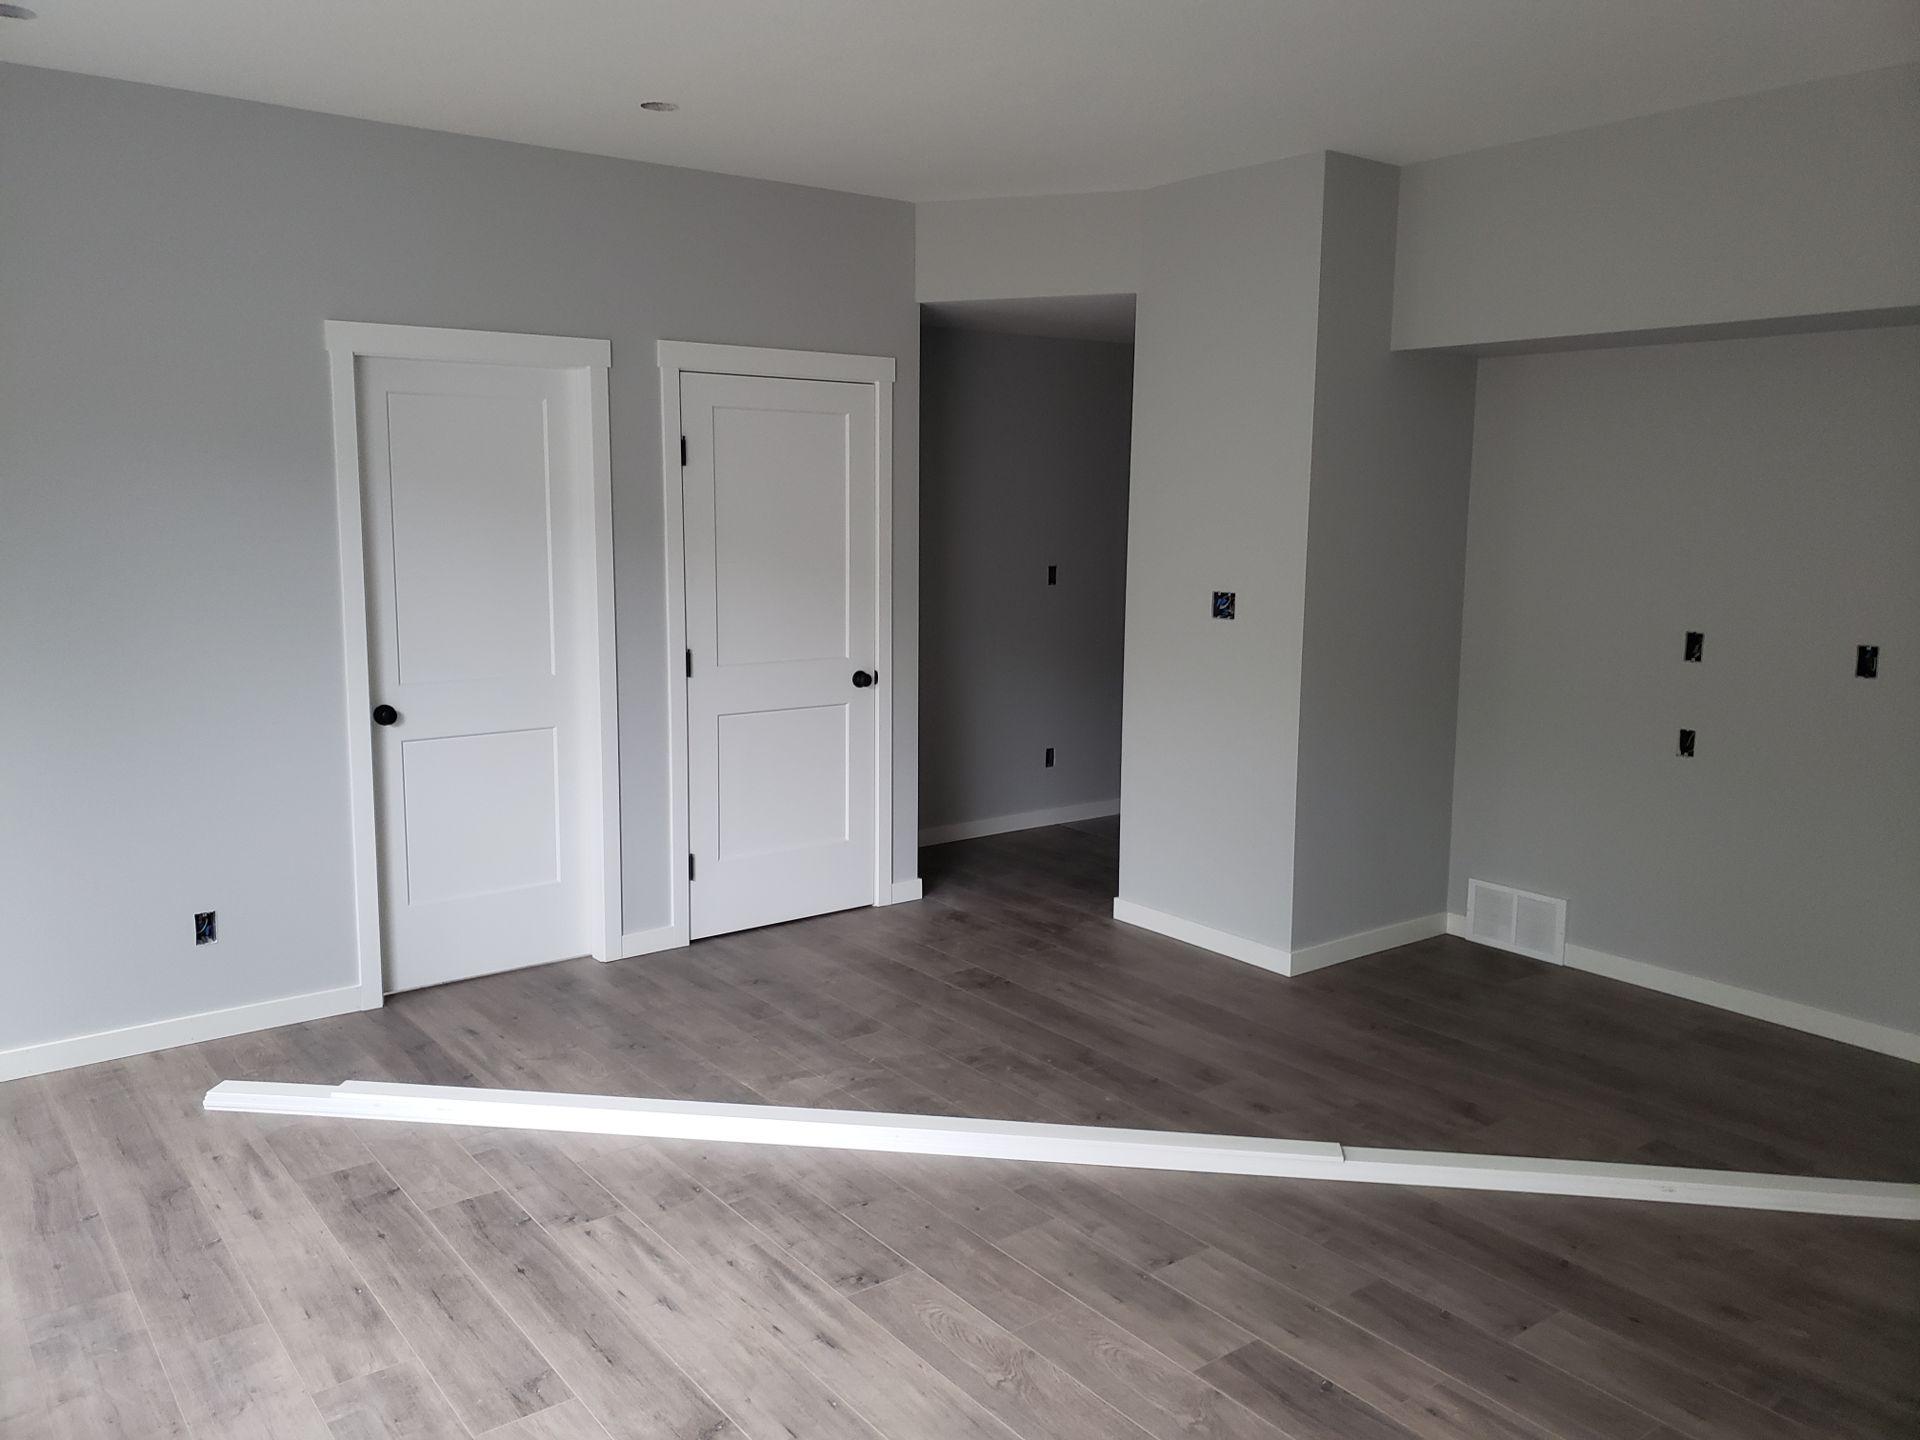 Cutting trim inside finished house-20180930_154138-01.jpeg